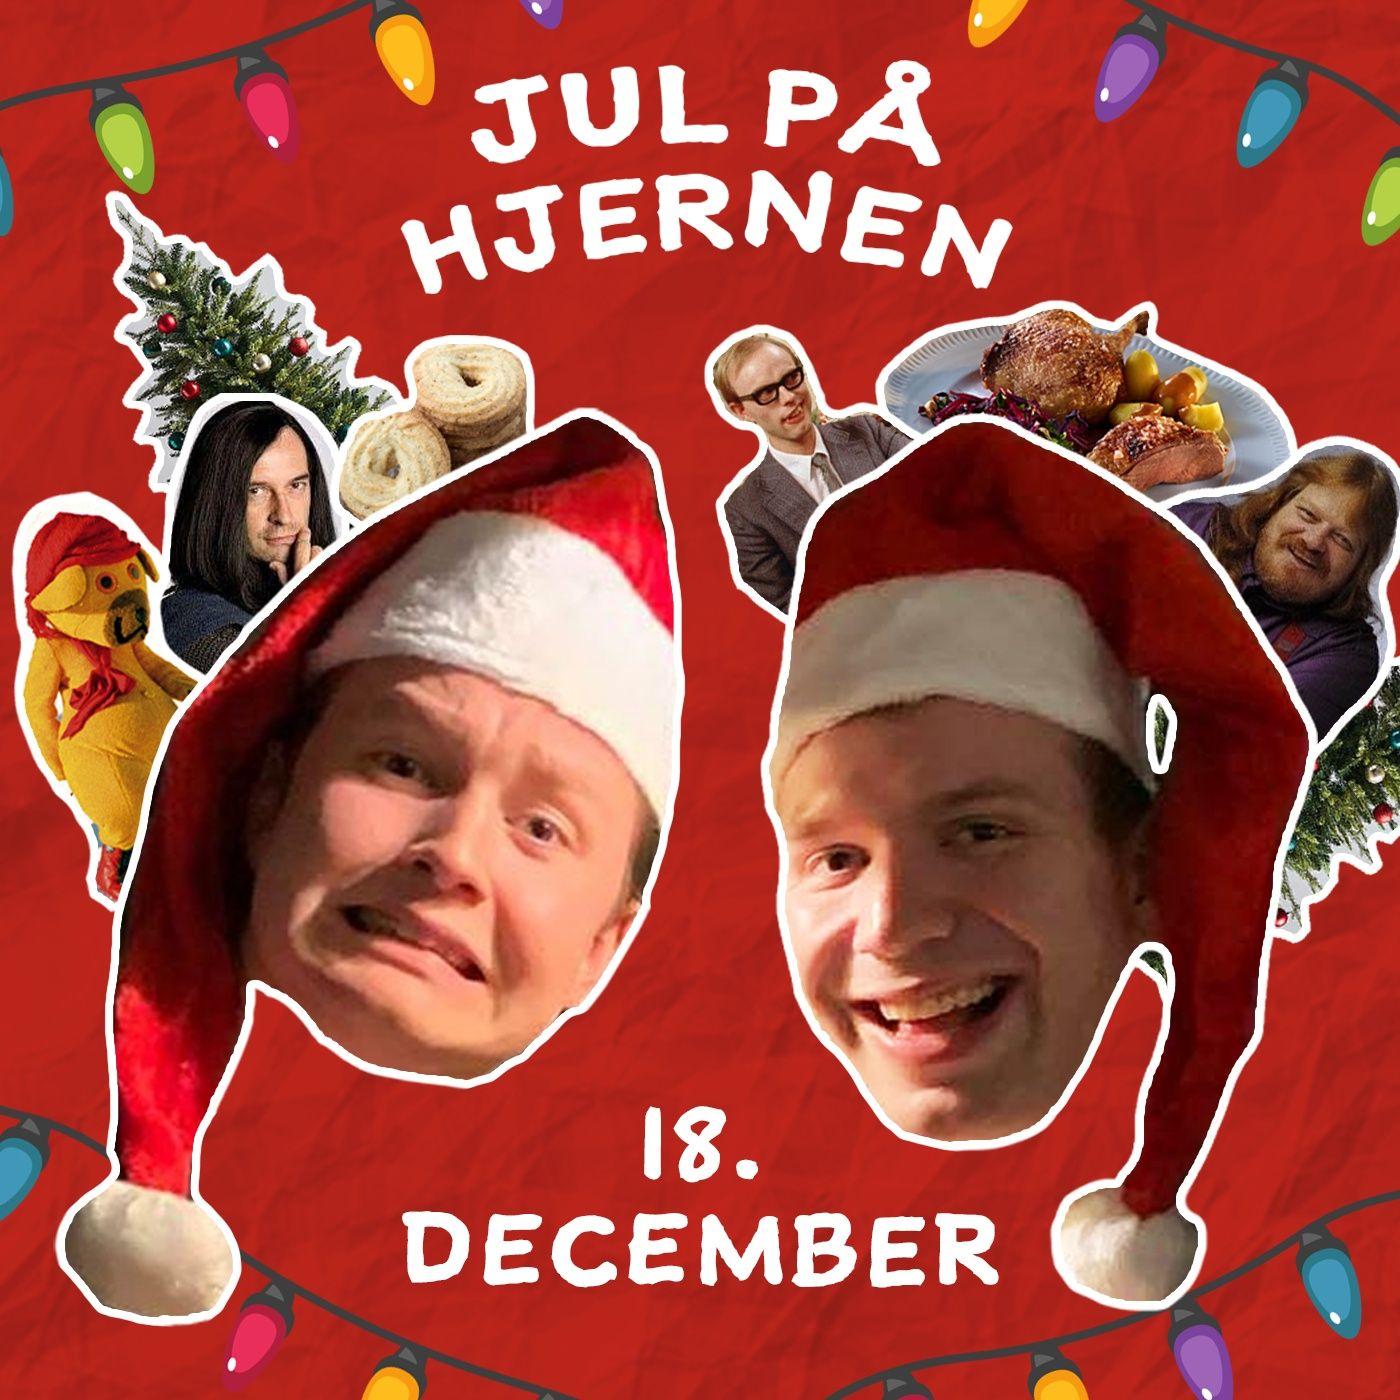 18 December - Jul på hjernen